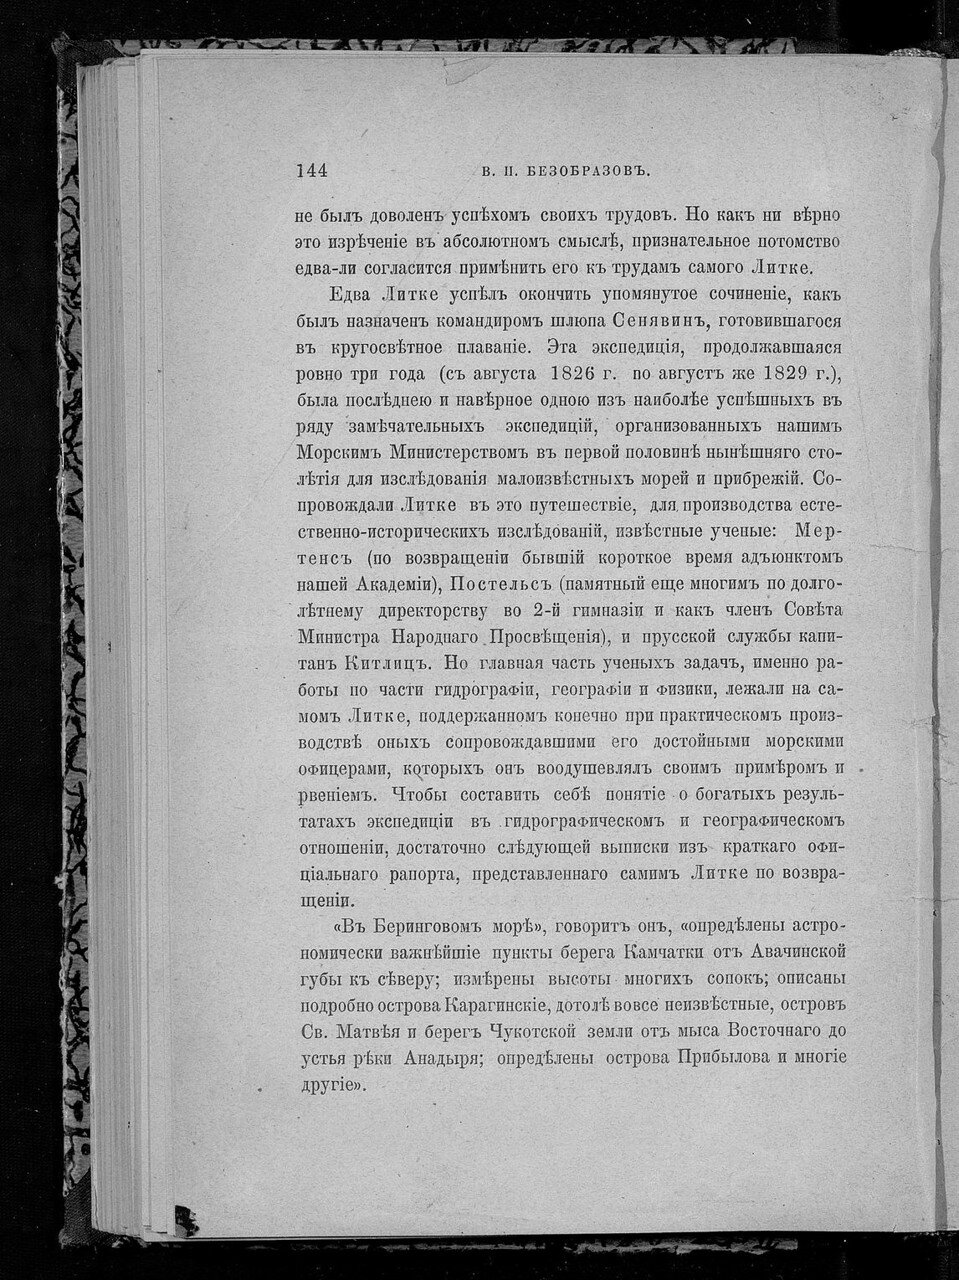 https://img-fotki.yandex.ru/get/897810/199368979.d6/0_21de2e_a56e55c1_XXXL.jpg